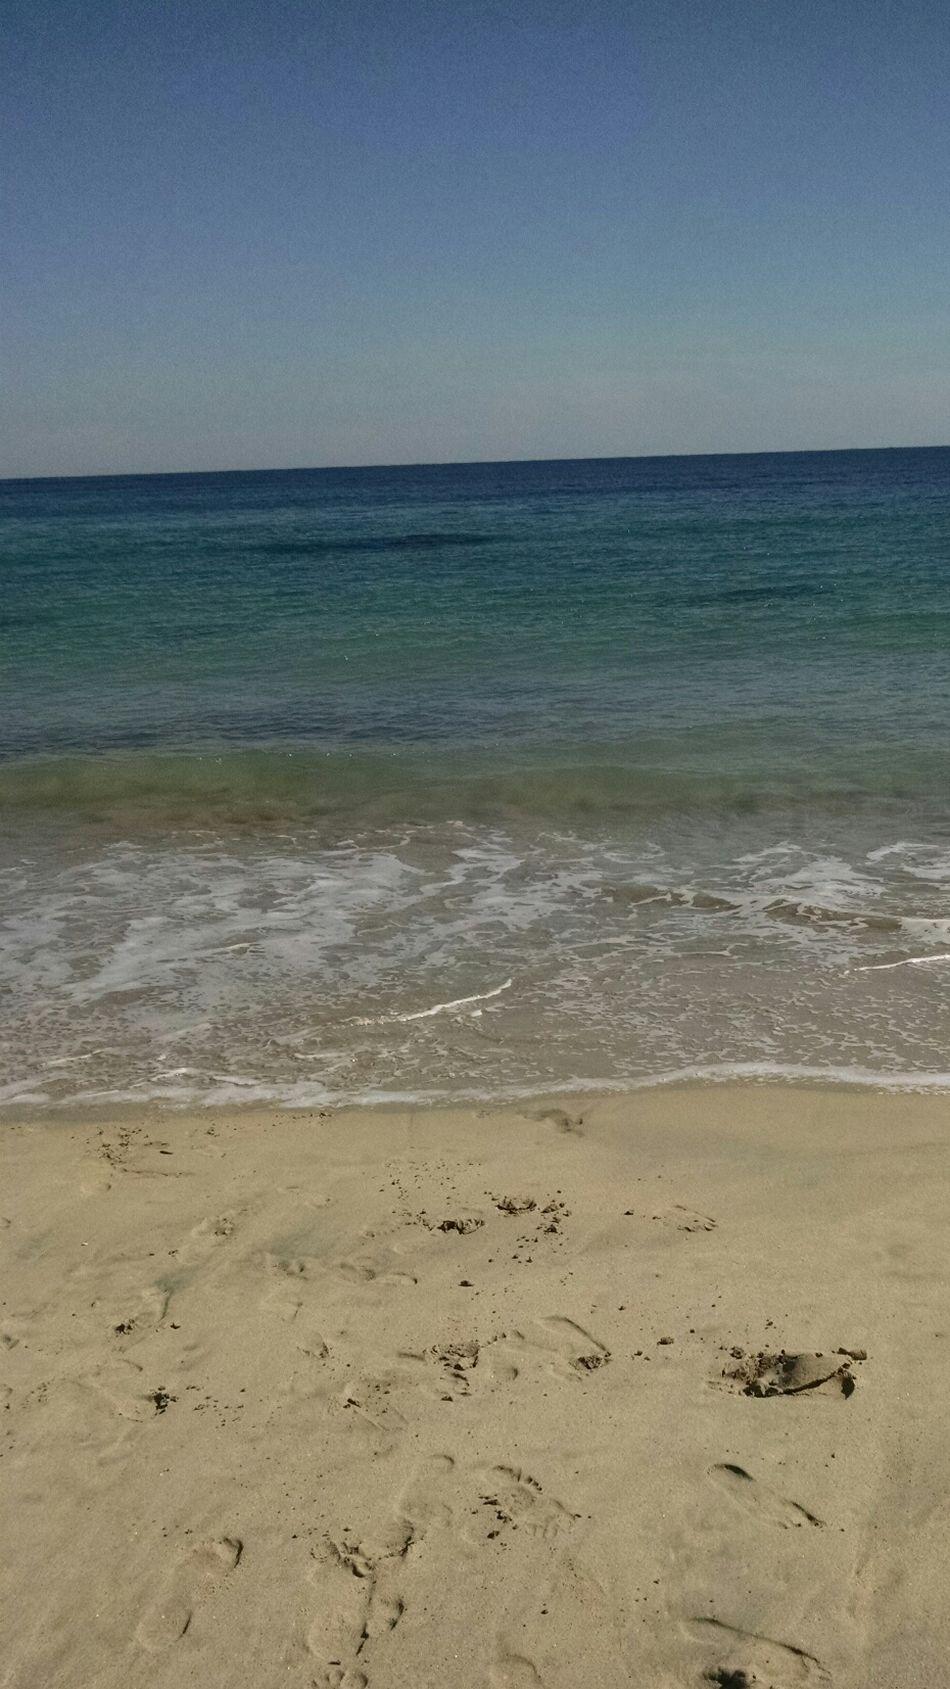 Day's Swimming Sunshine Sea Relaxing Algarrobo Chile 18sept Colors ♥ Hello ❤